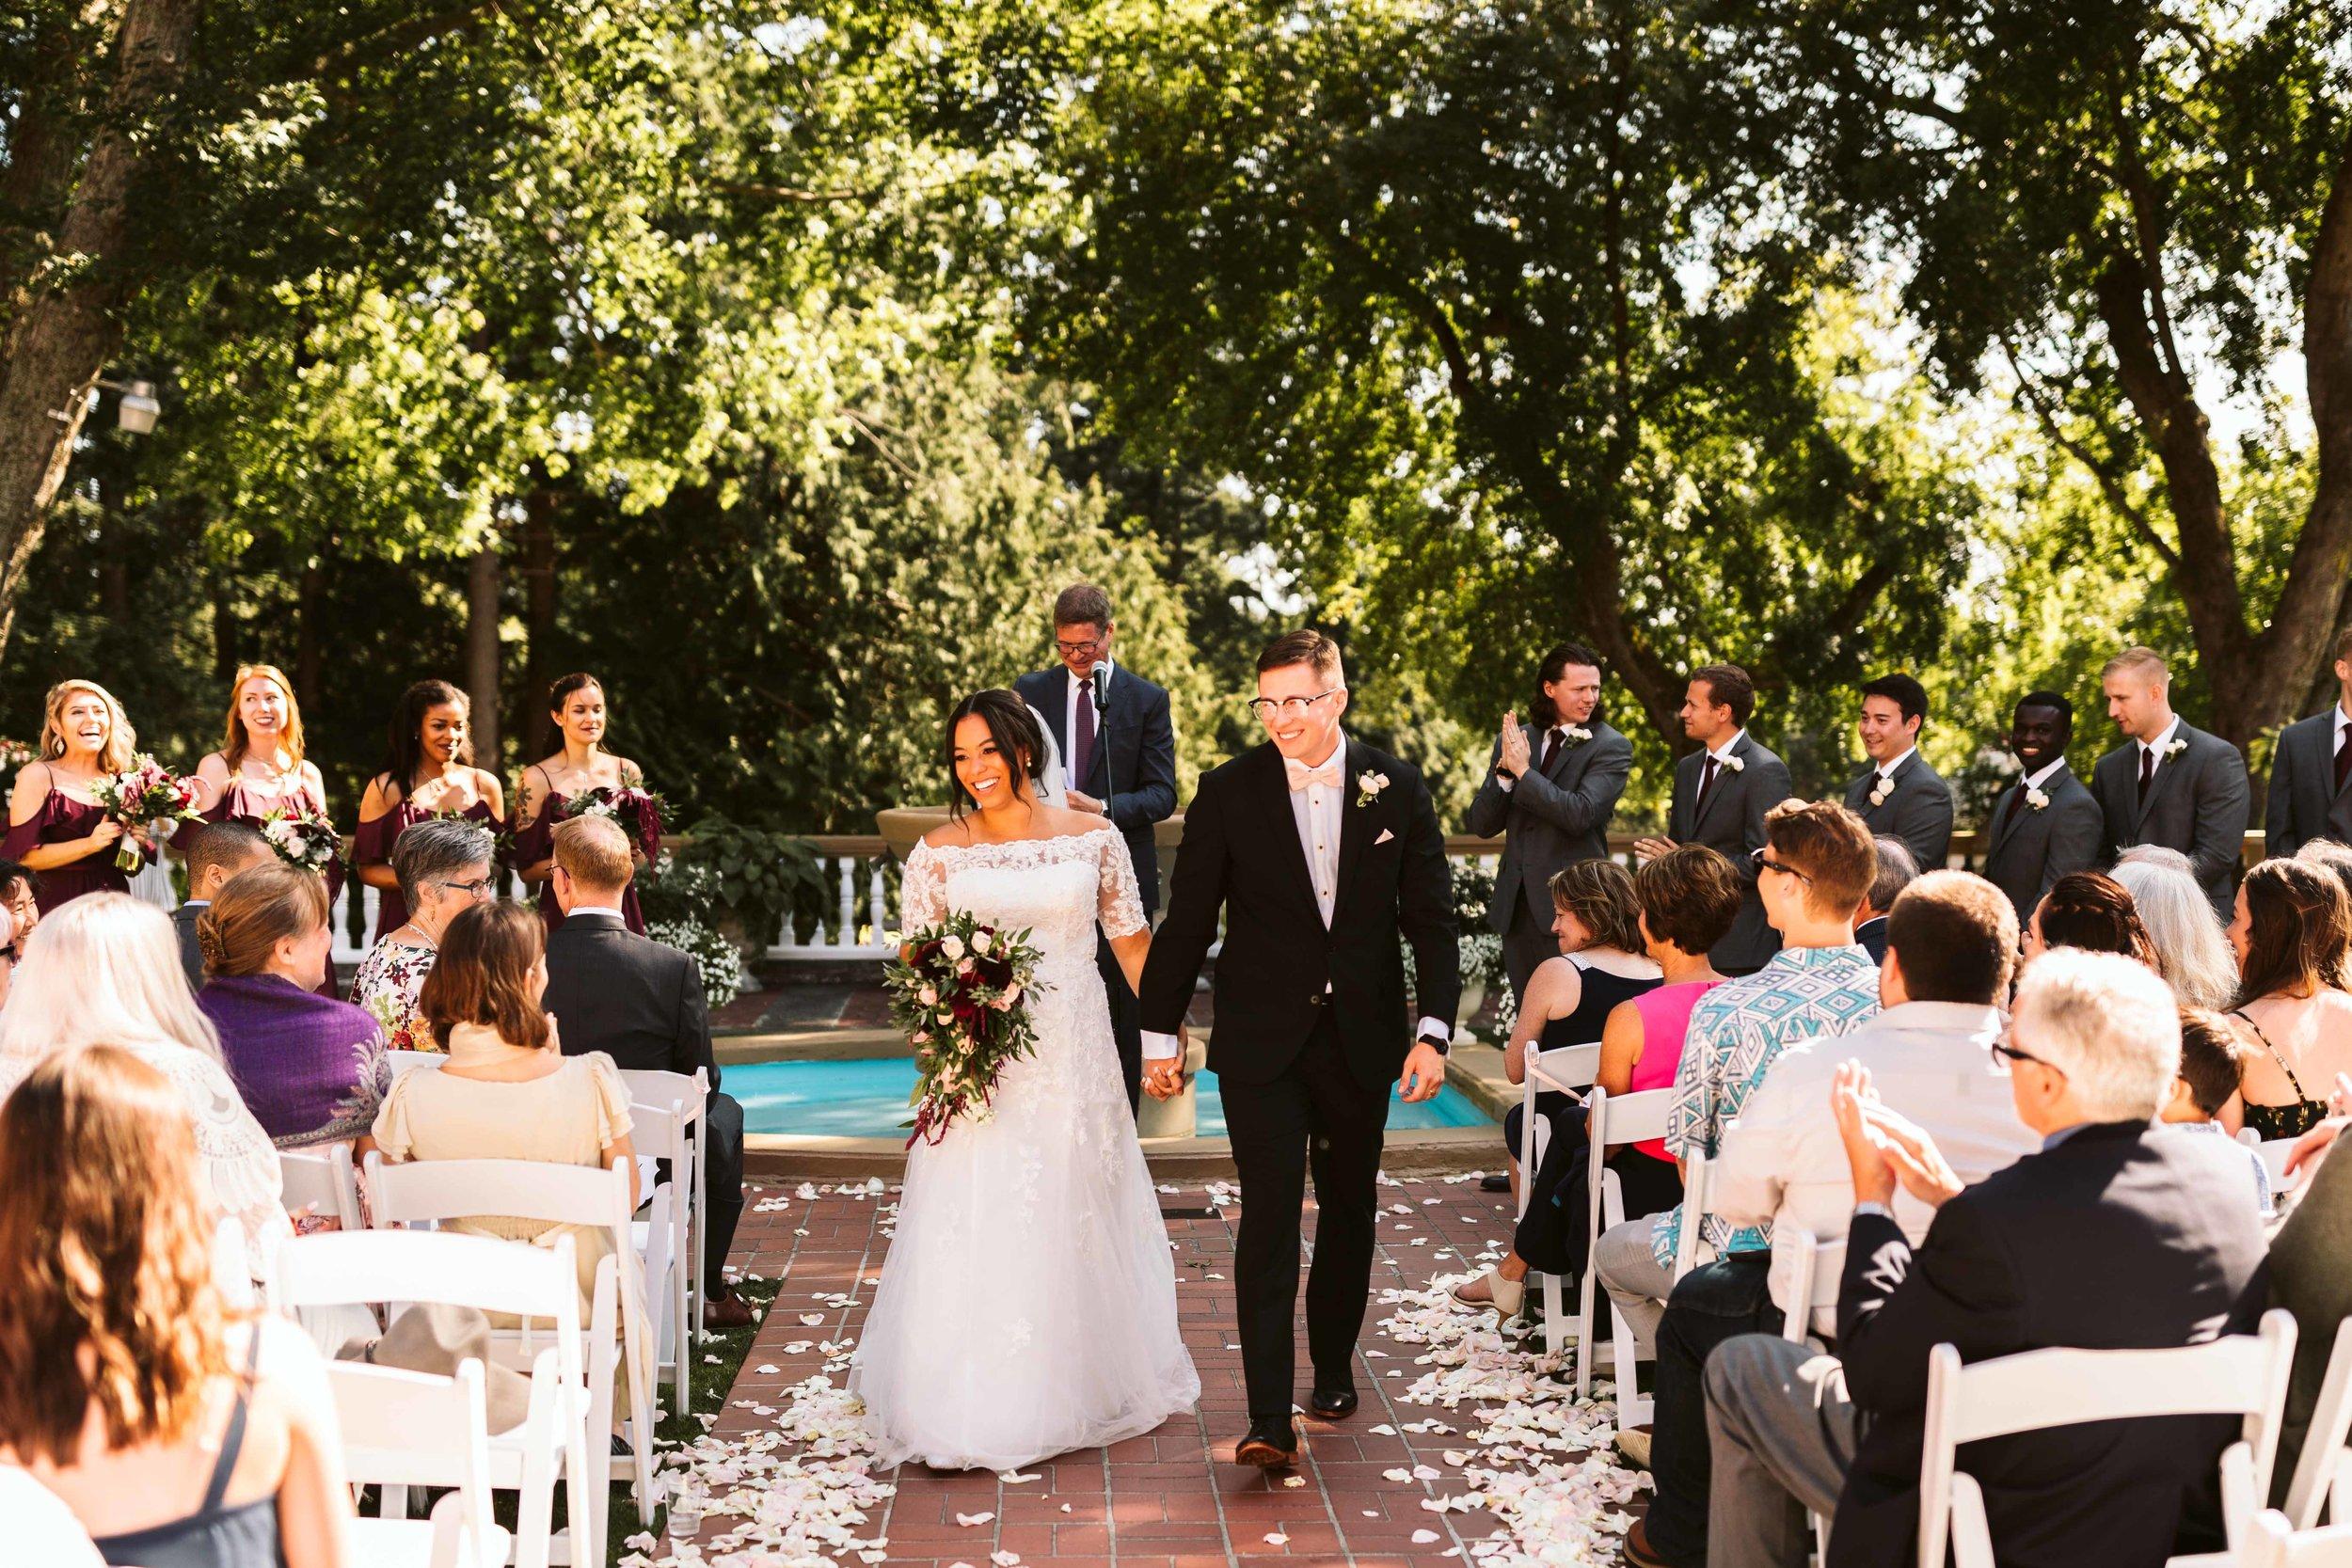 lairmont-manor-wedding-65.jpg